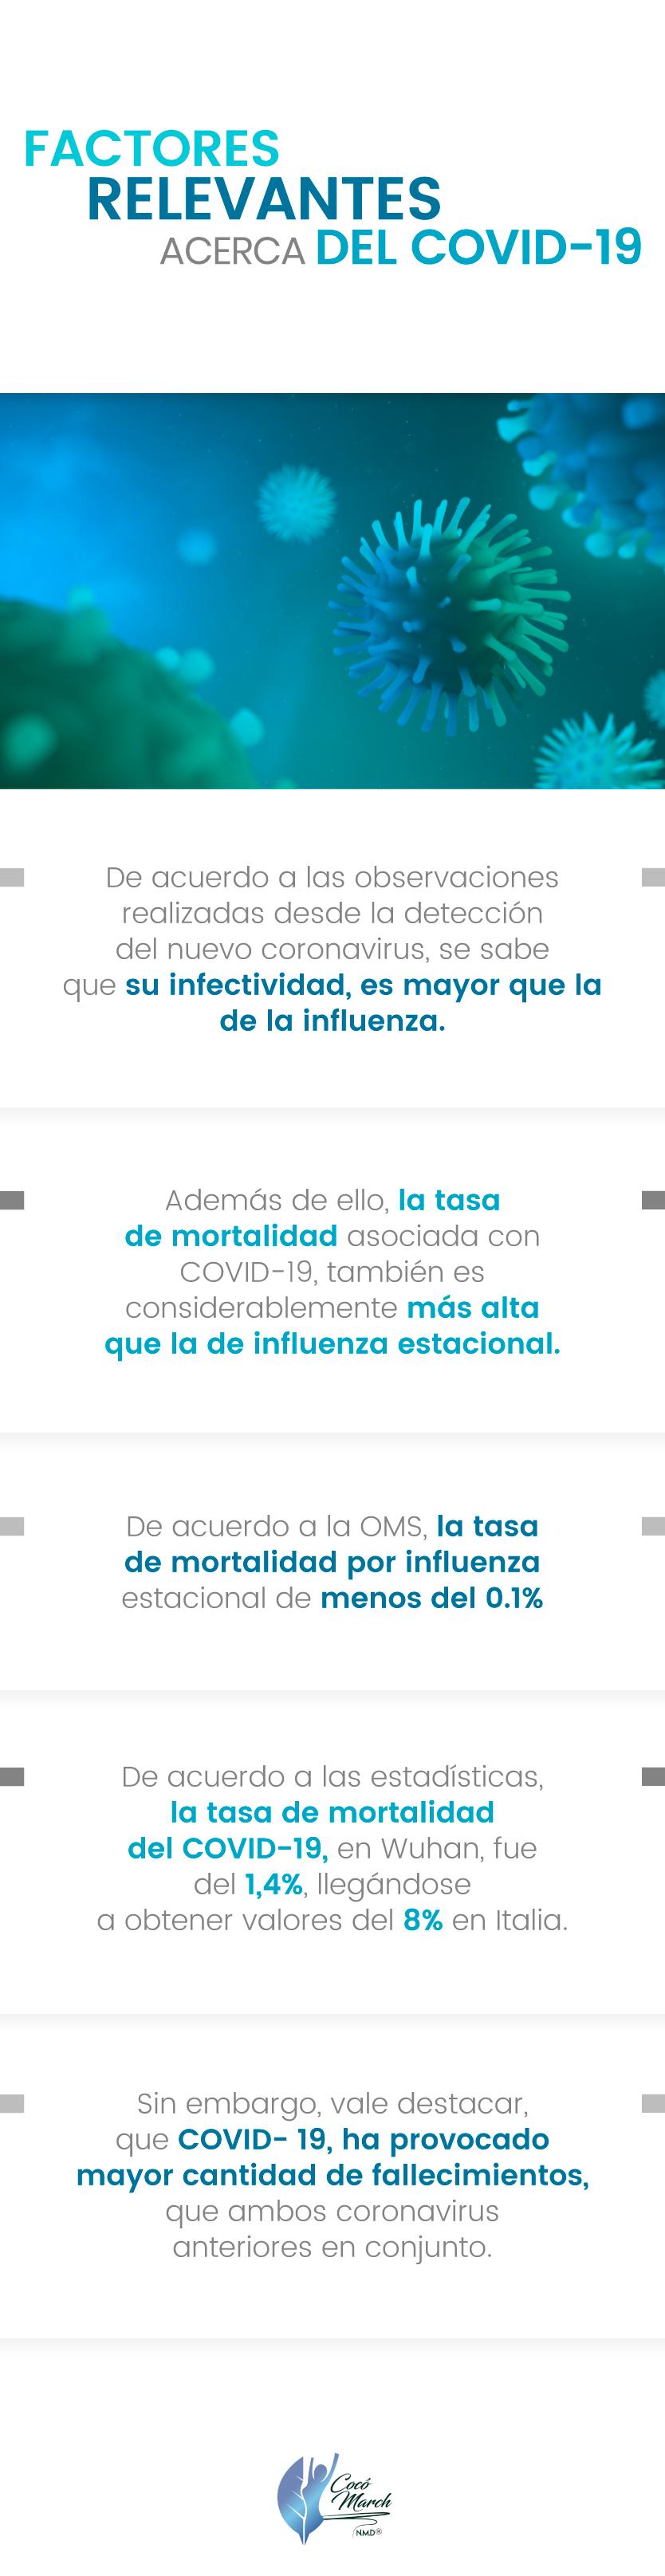 factores-relevantes-del-covid-19